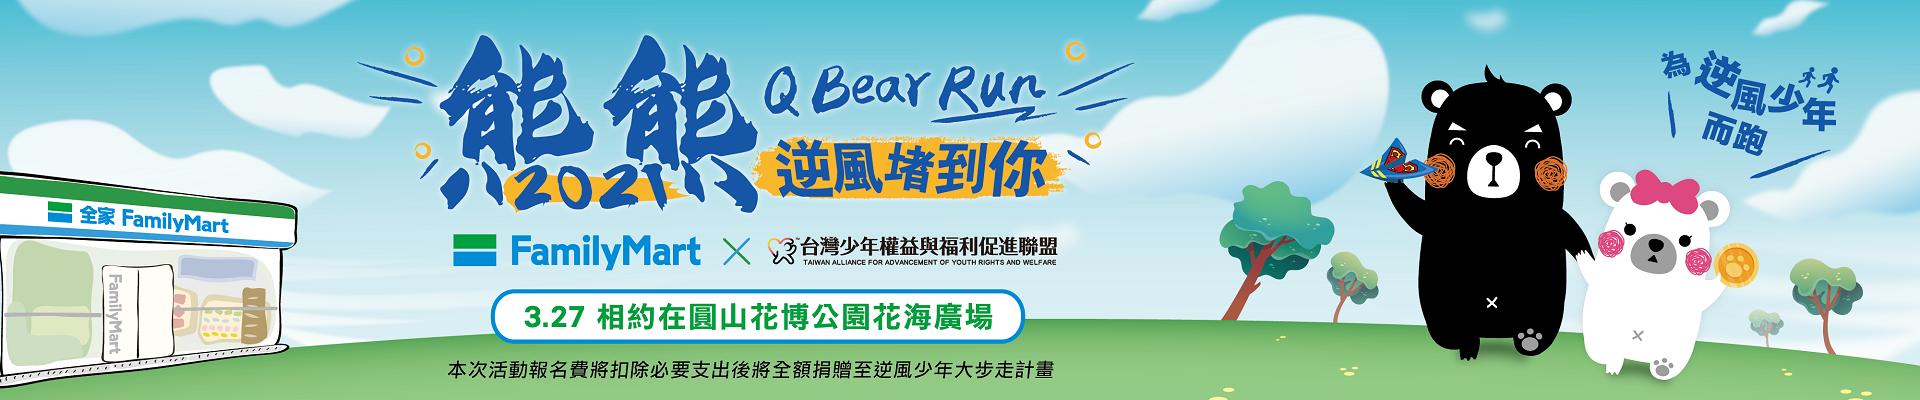 2021 Q Bear Run 熊熊逆風堵到你-主視覺